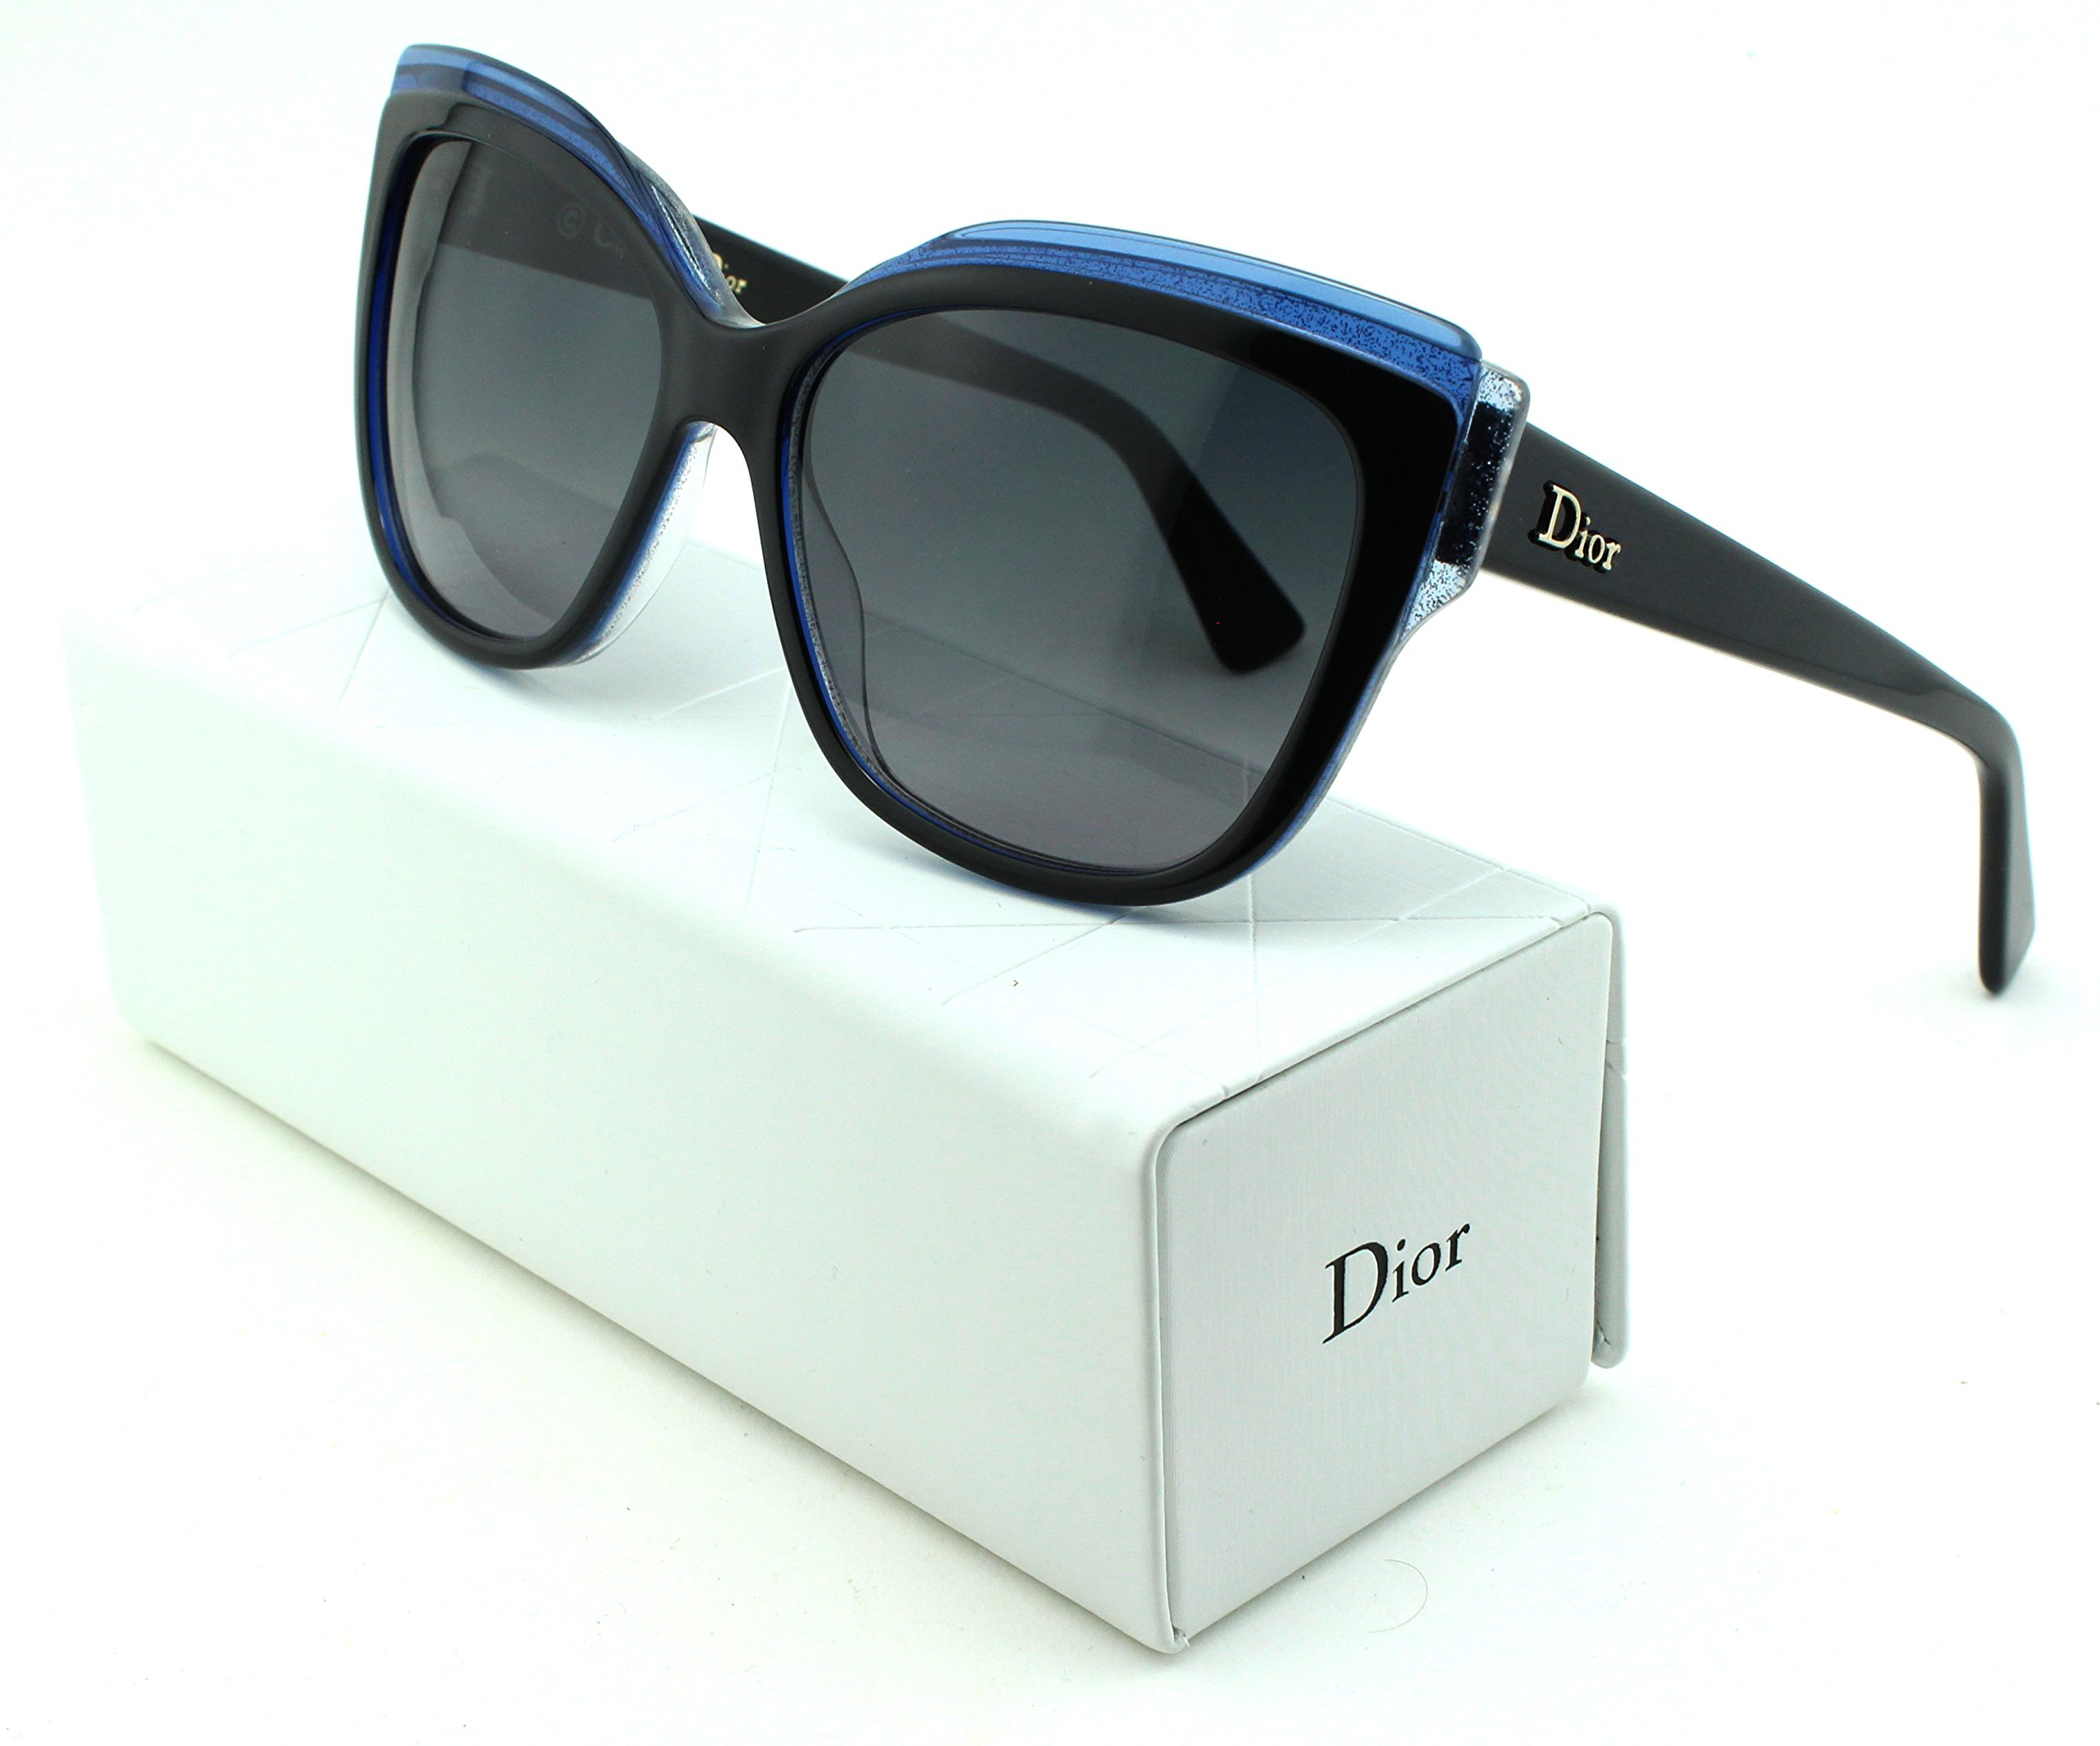 Dior Glisten 2 Cateye Women Sunglasses (Black Blue Frame, Grey Gradient Lens (0E1X))